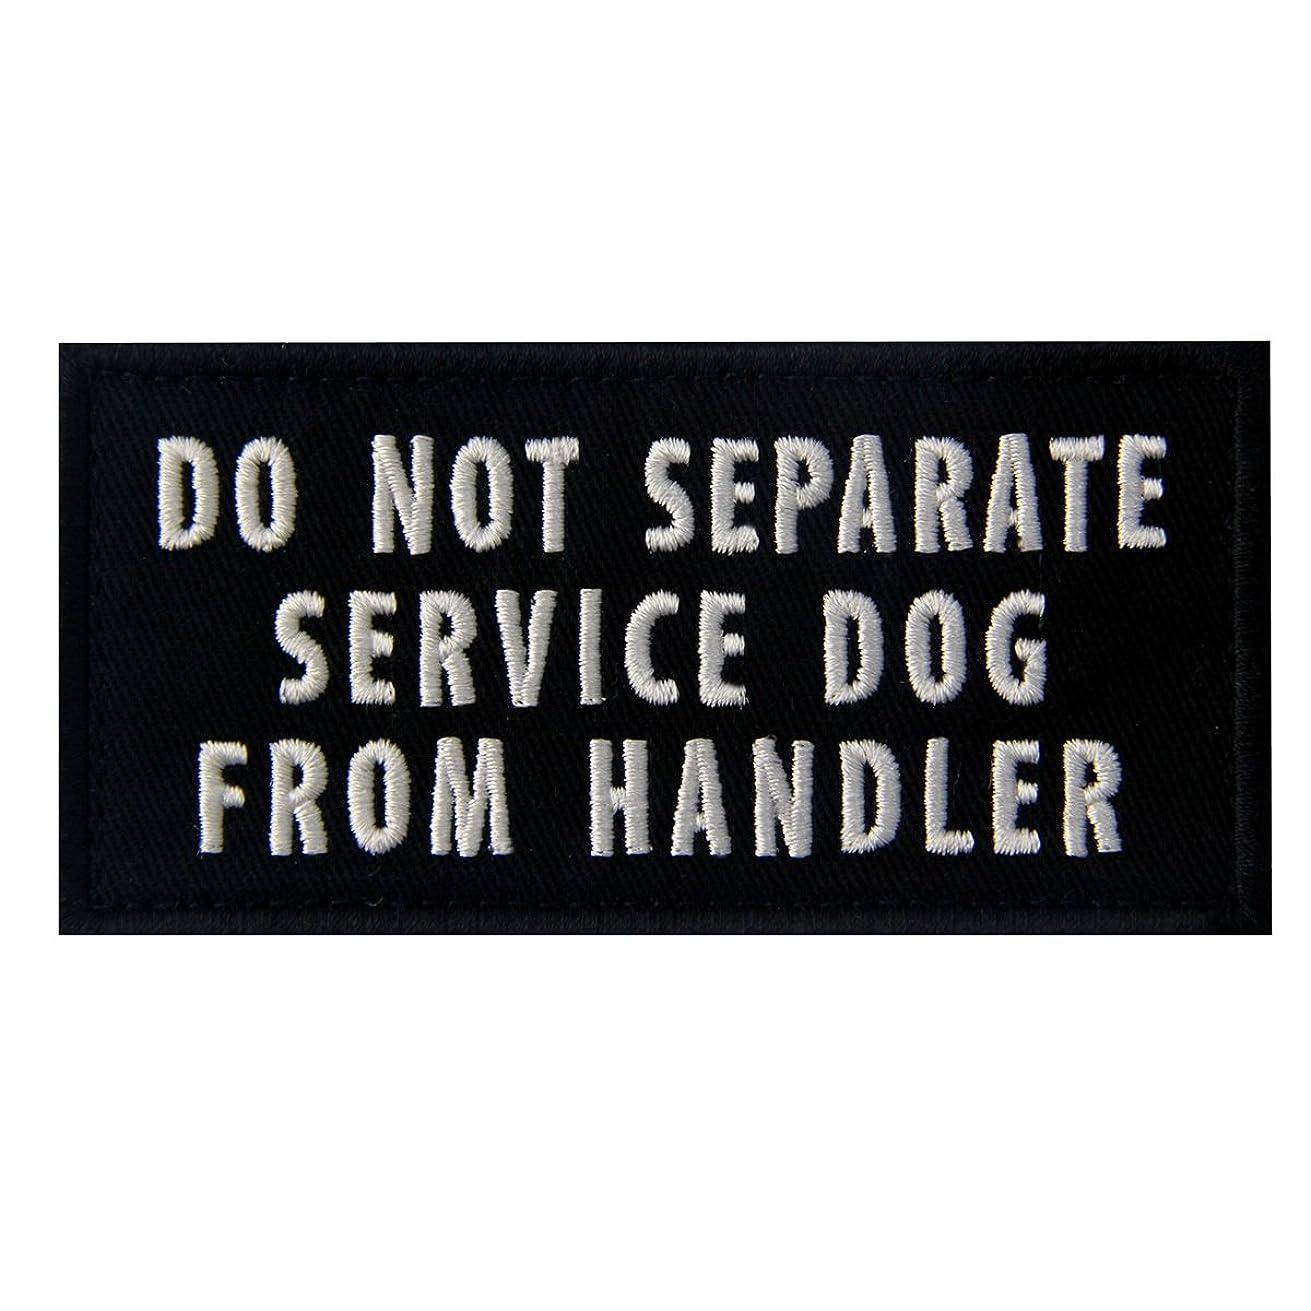 Do Not Separate Service Dog from Handler Vests/Harnesses Emblem Embroidered Fastener Hook & Loop Patch, 4 X 2 Inch